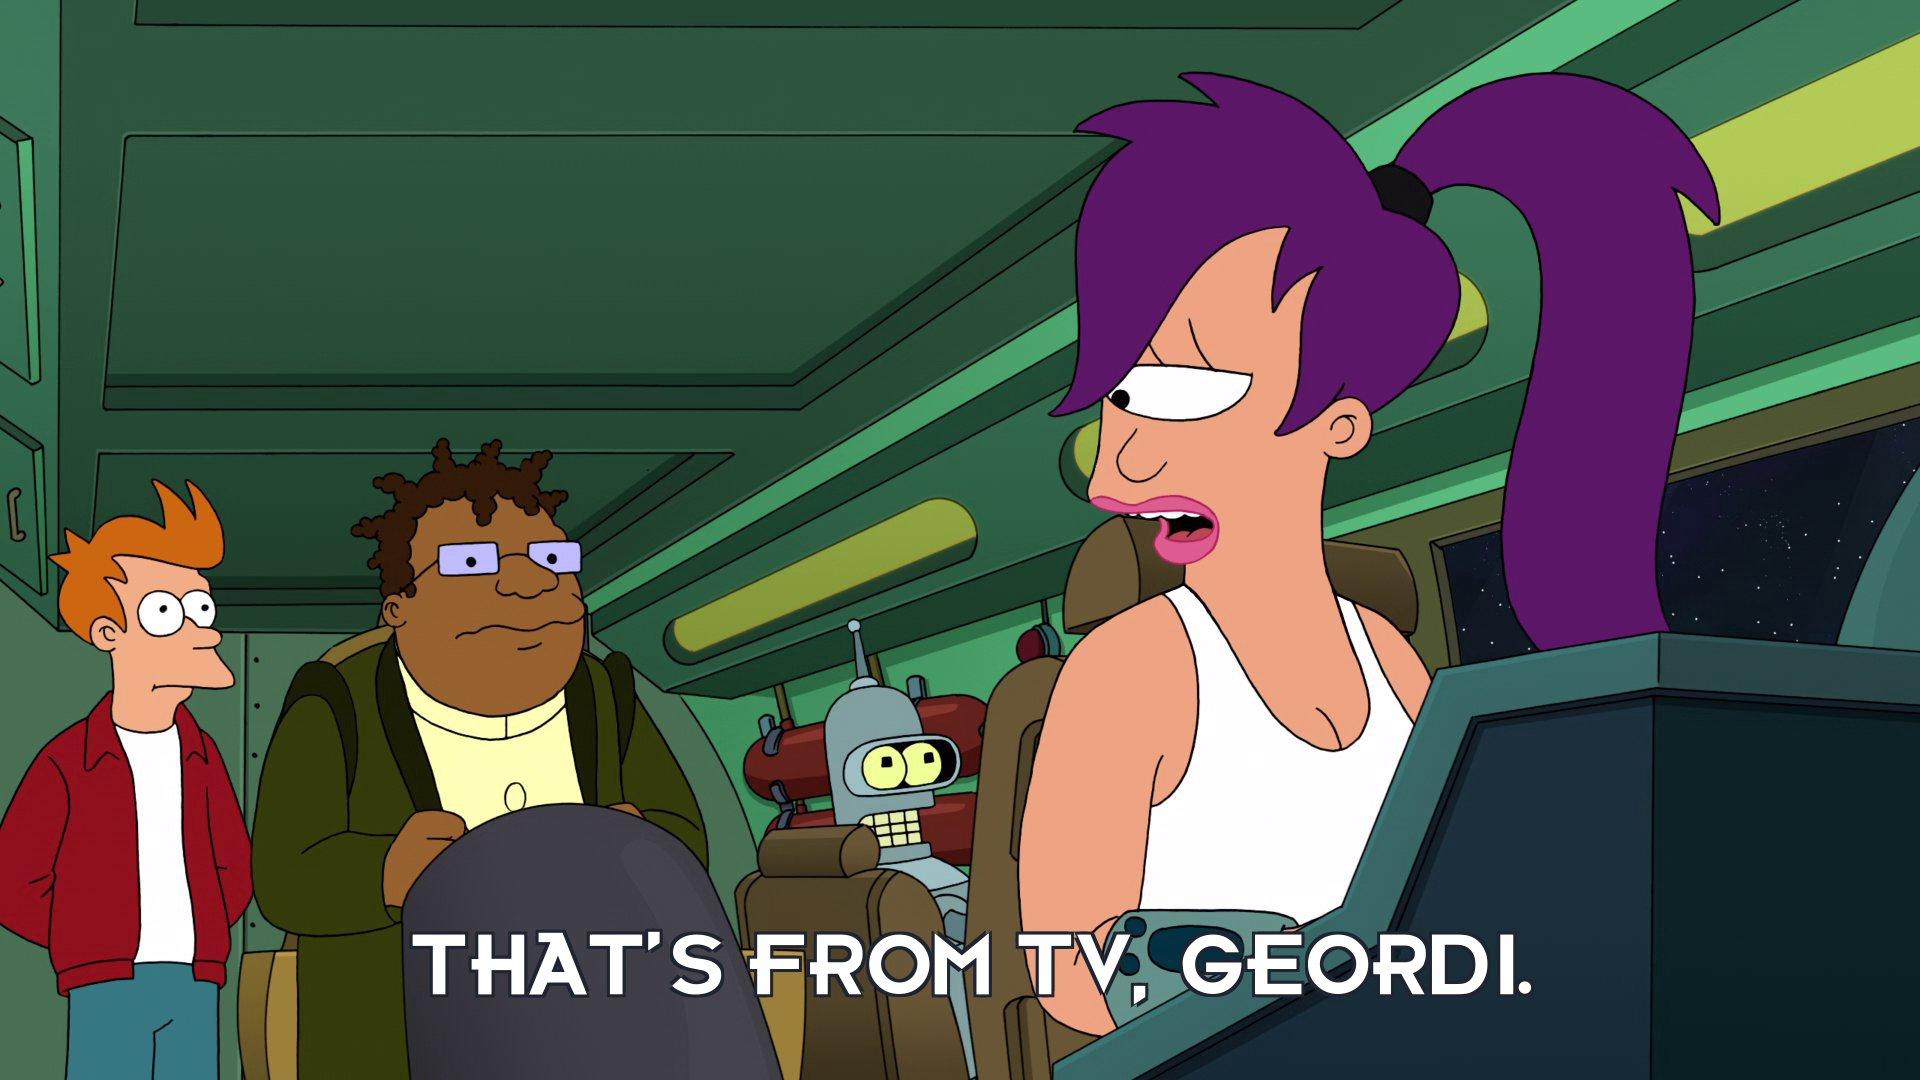 Turanga Leela: That's from TV, Geordi.